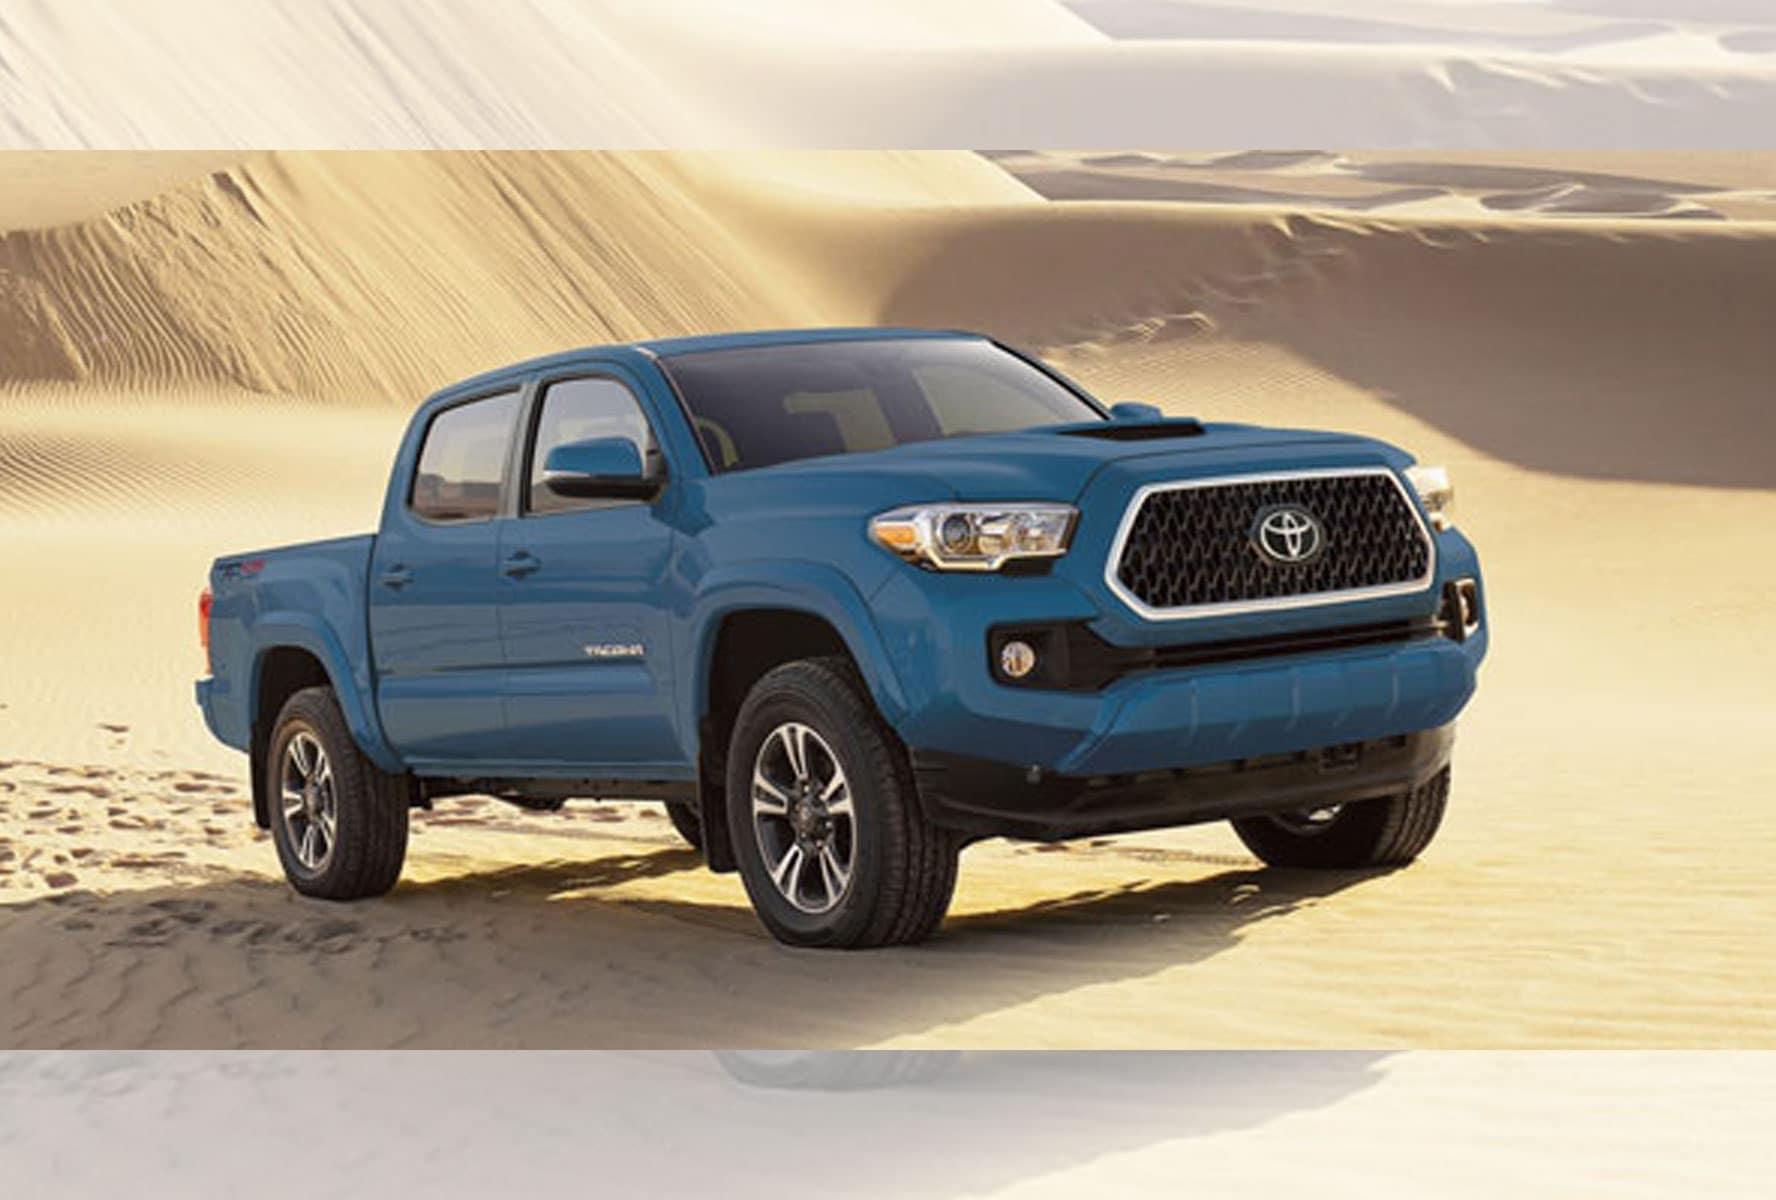 New Toyota Inventory near Keystone Heights, FL